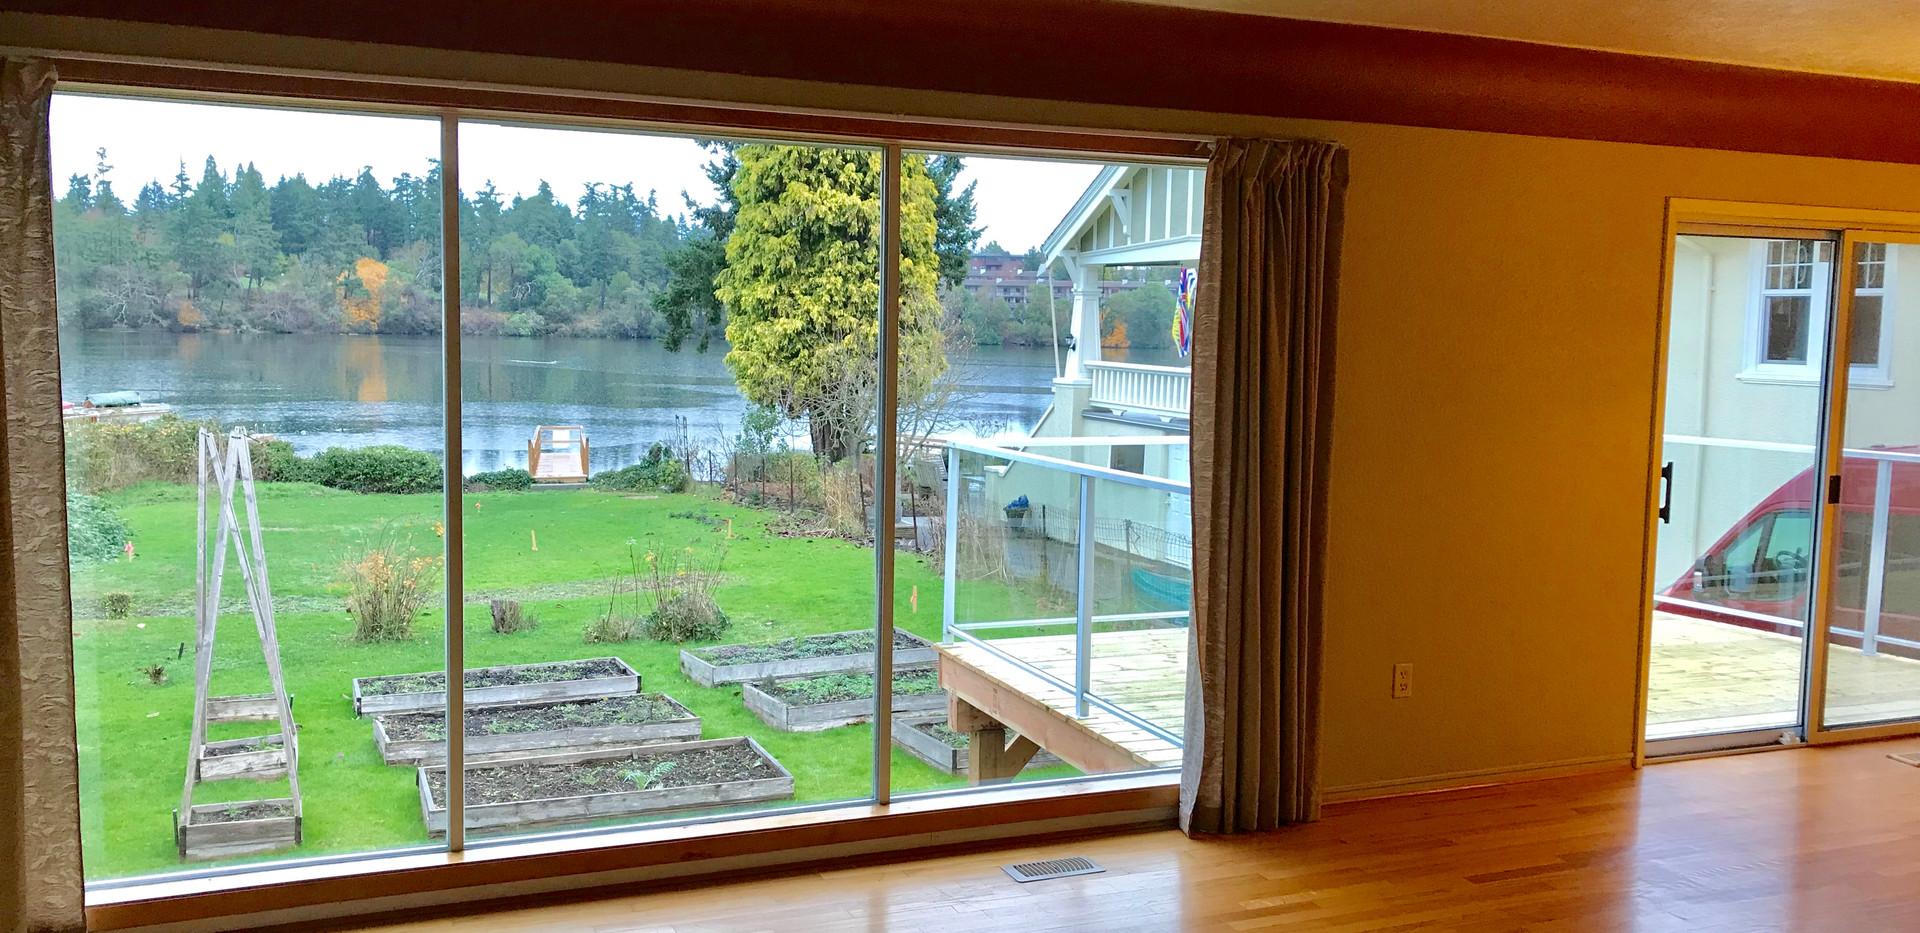 Livingroom View - no furniture.jpg